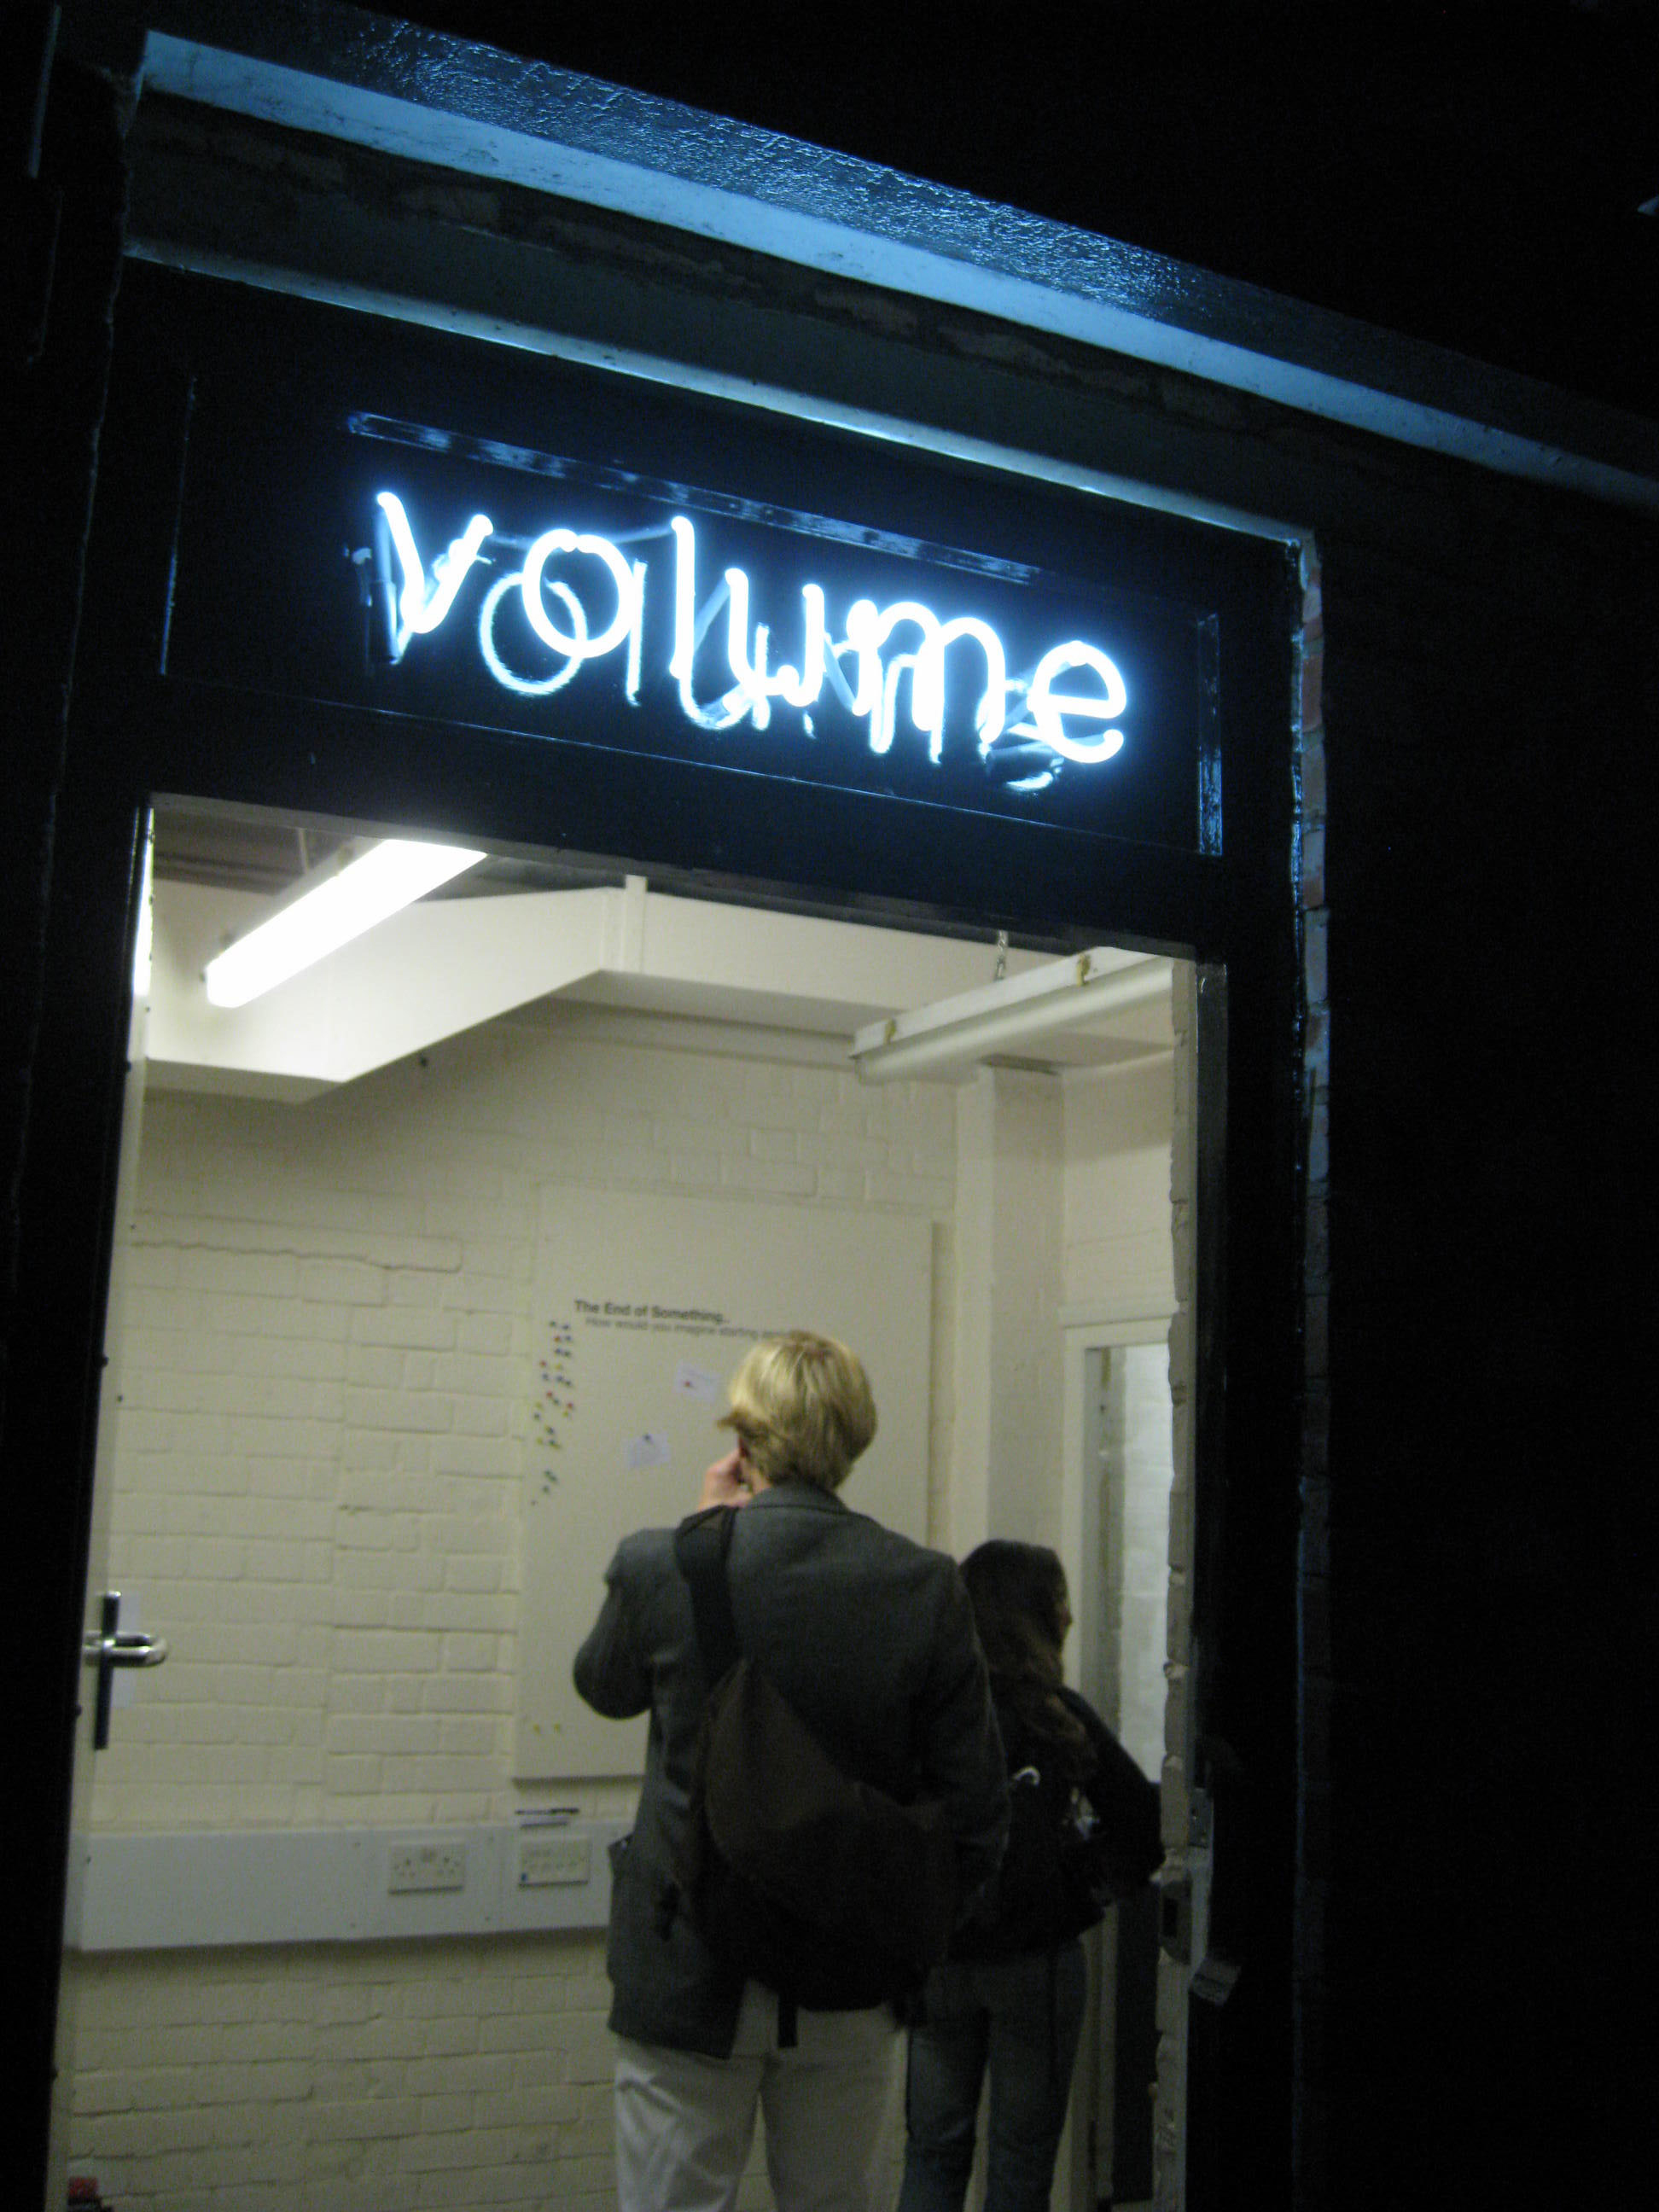 Volume, London, 2005